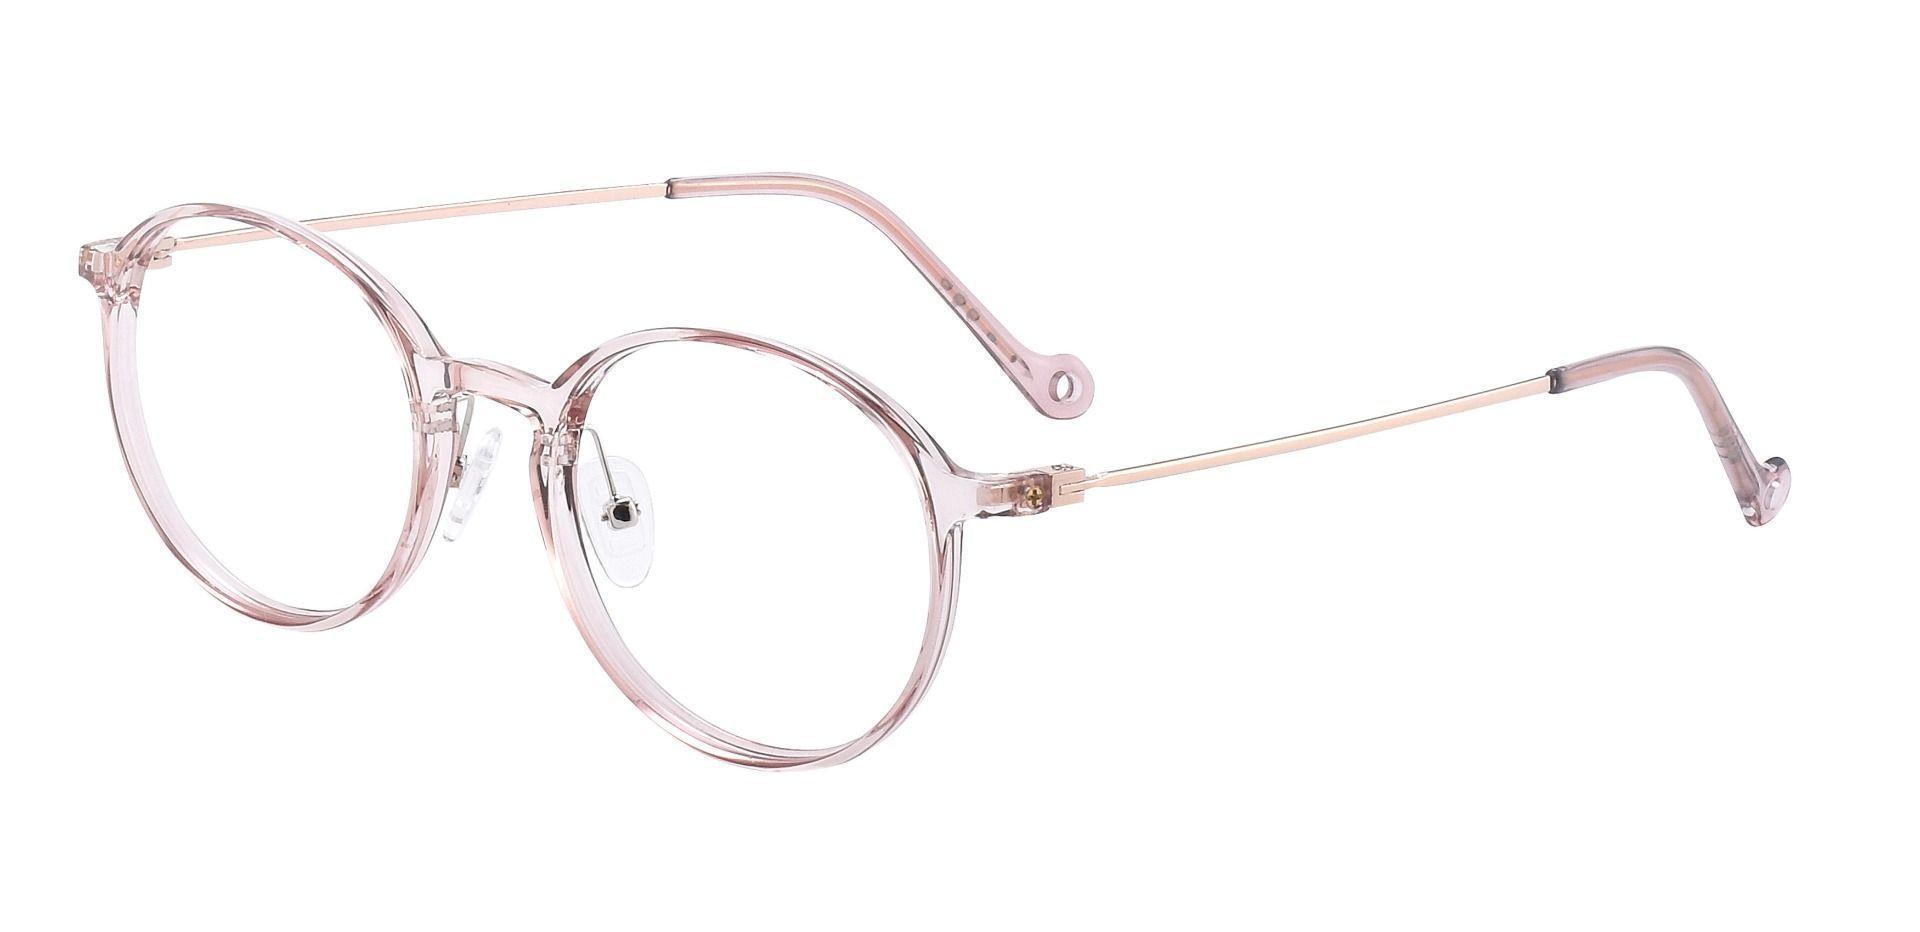 Blythe Round Prescription Glasses - Pink